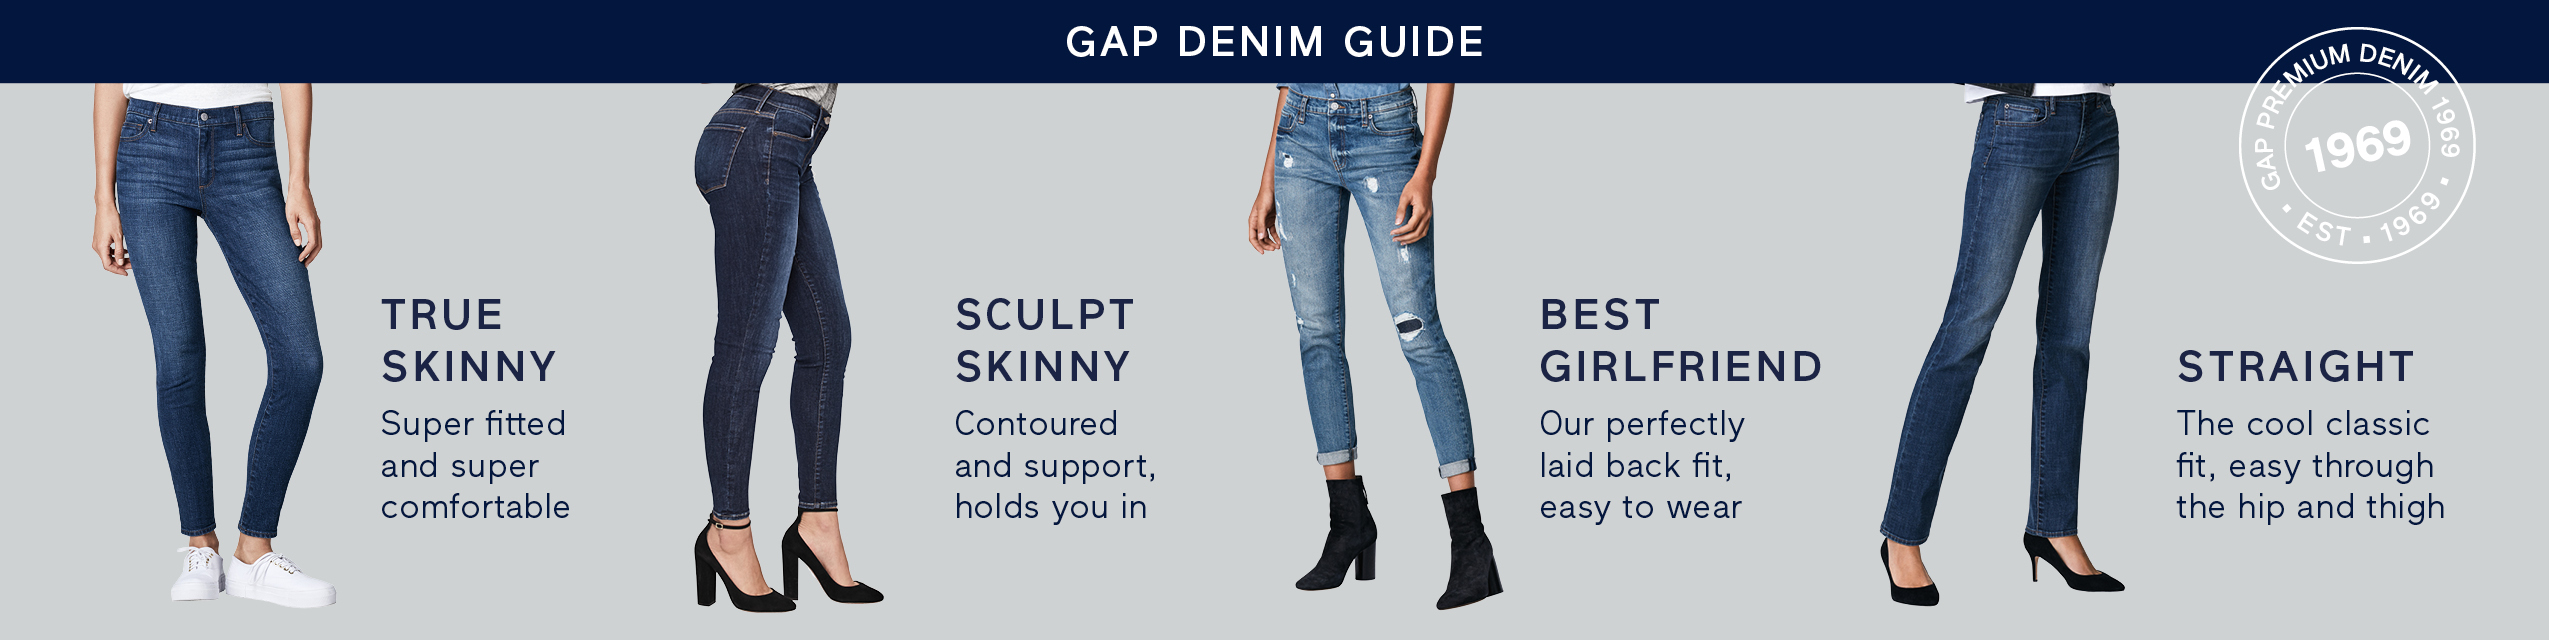 89053be4ea3 Jeans Femme GAP